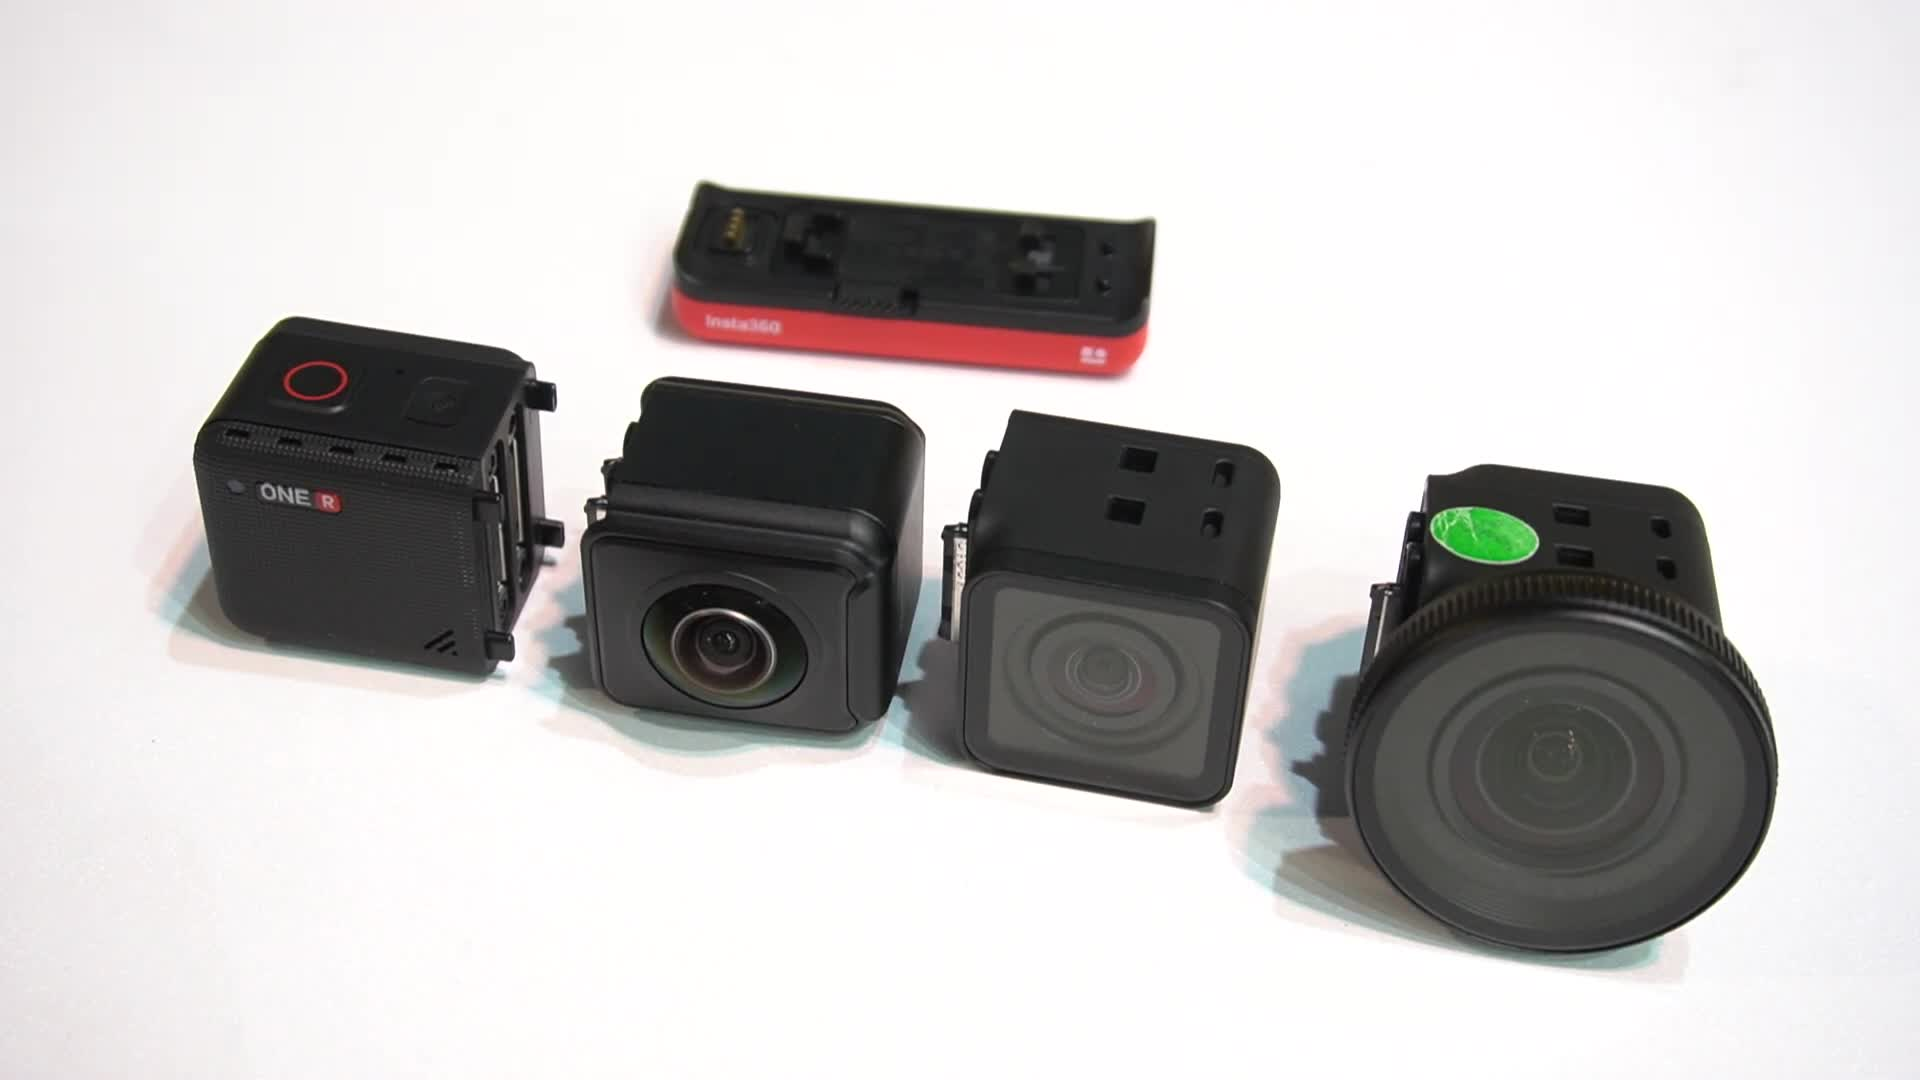 Hands-On, Ces, Hands on, NewGadgets, Johannes Knapp, CES 2020, Action-Cam, Action-Kamera, Insta360, Insta360 ONE R